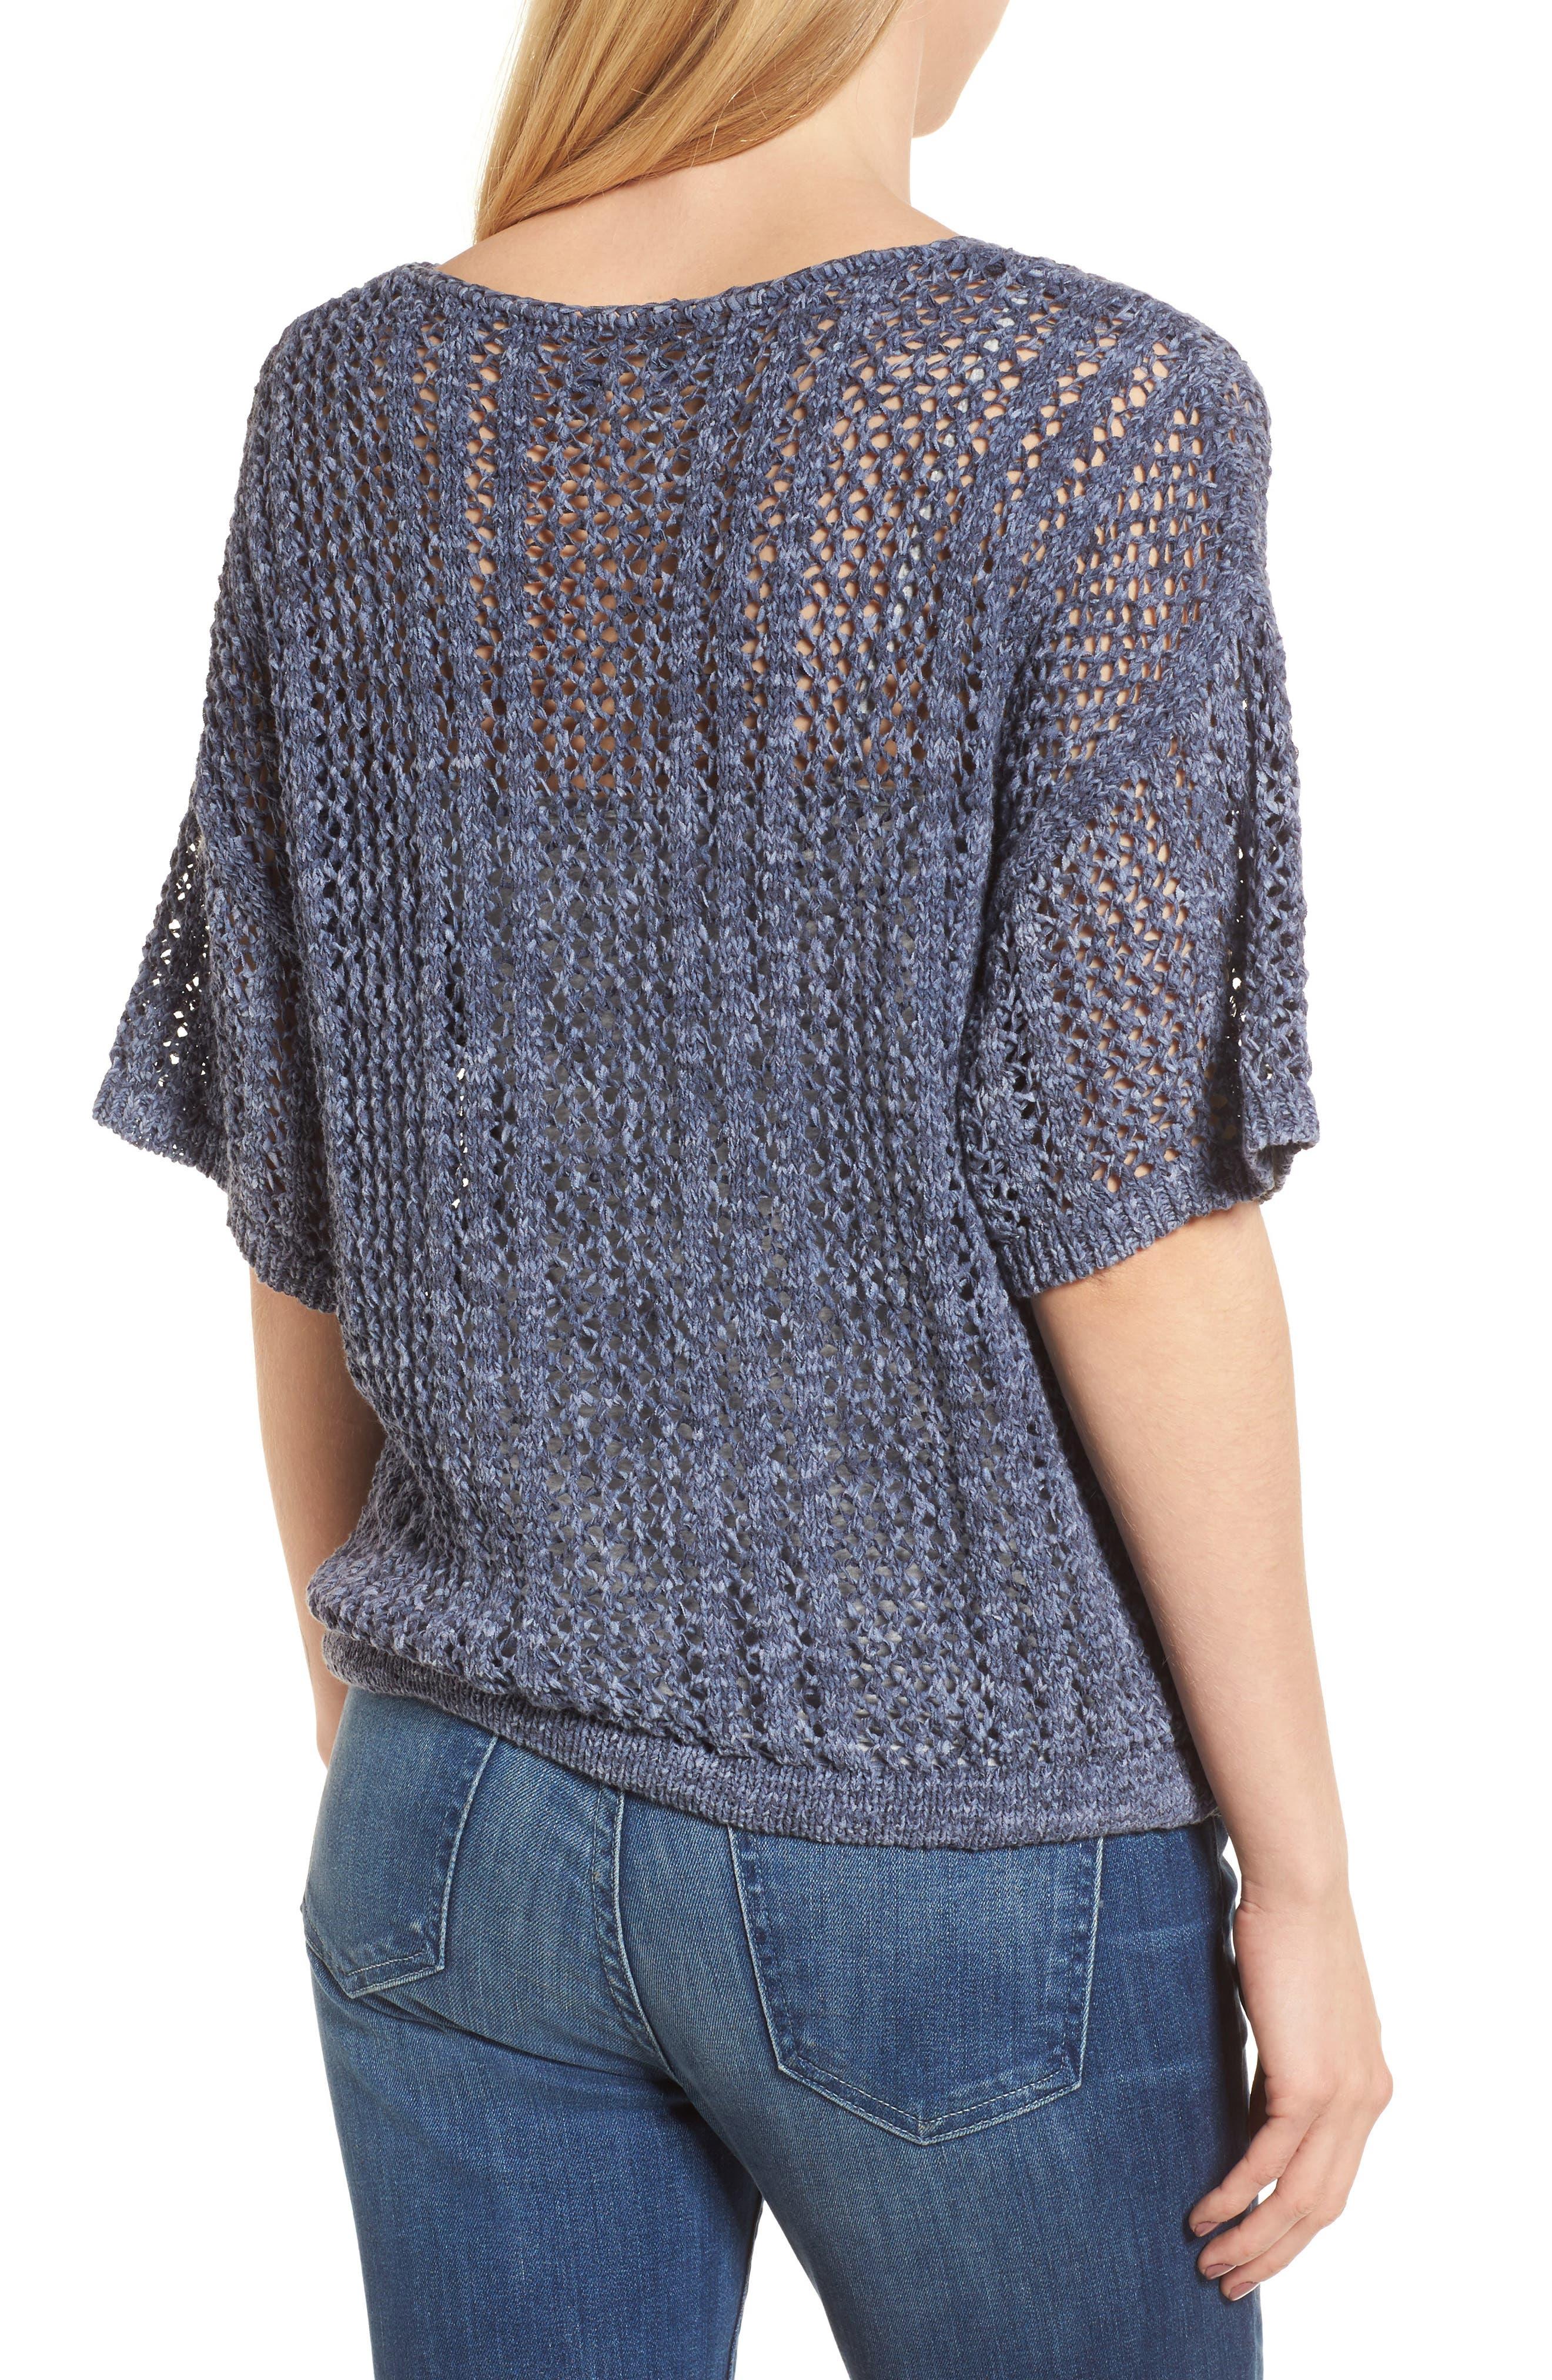 Knox Crochet Sweater,                             Alternate thumbnail 2, color,